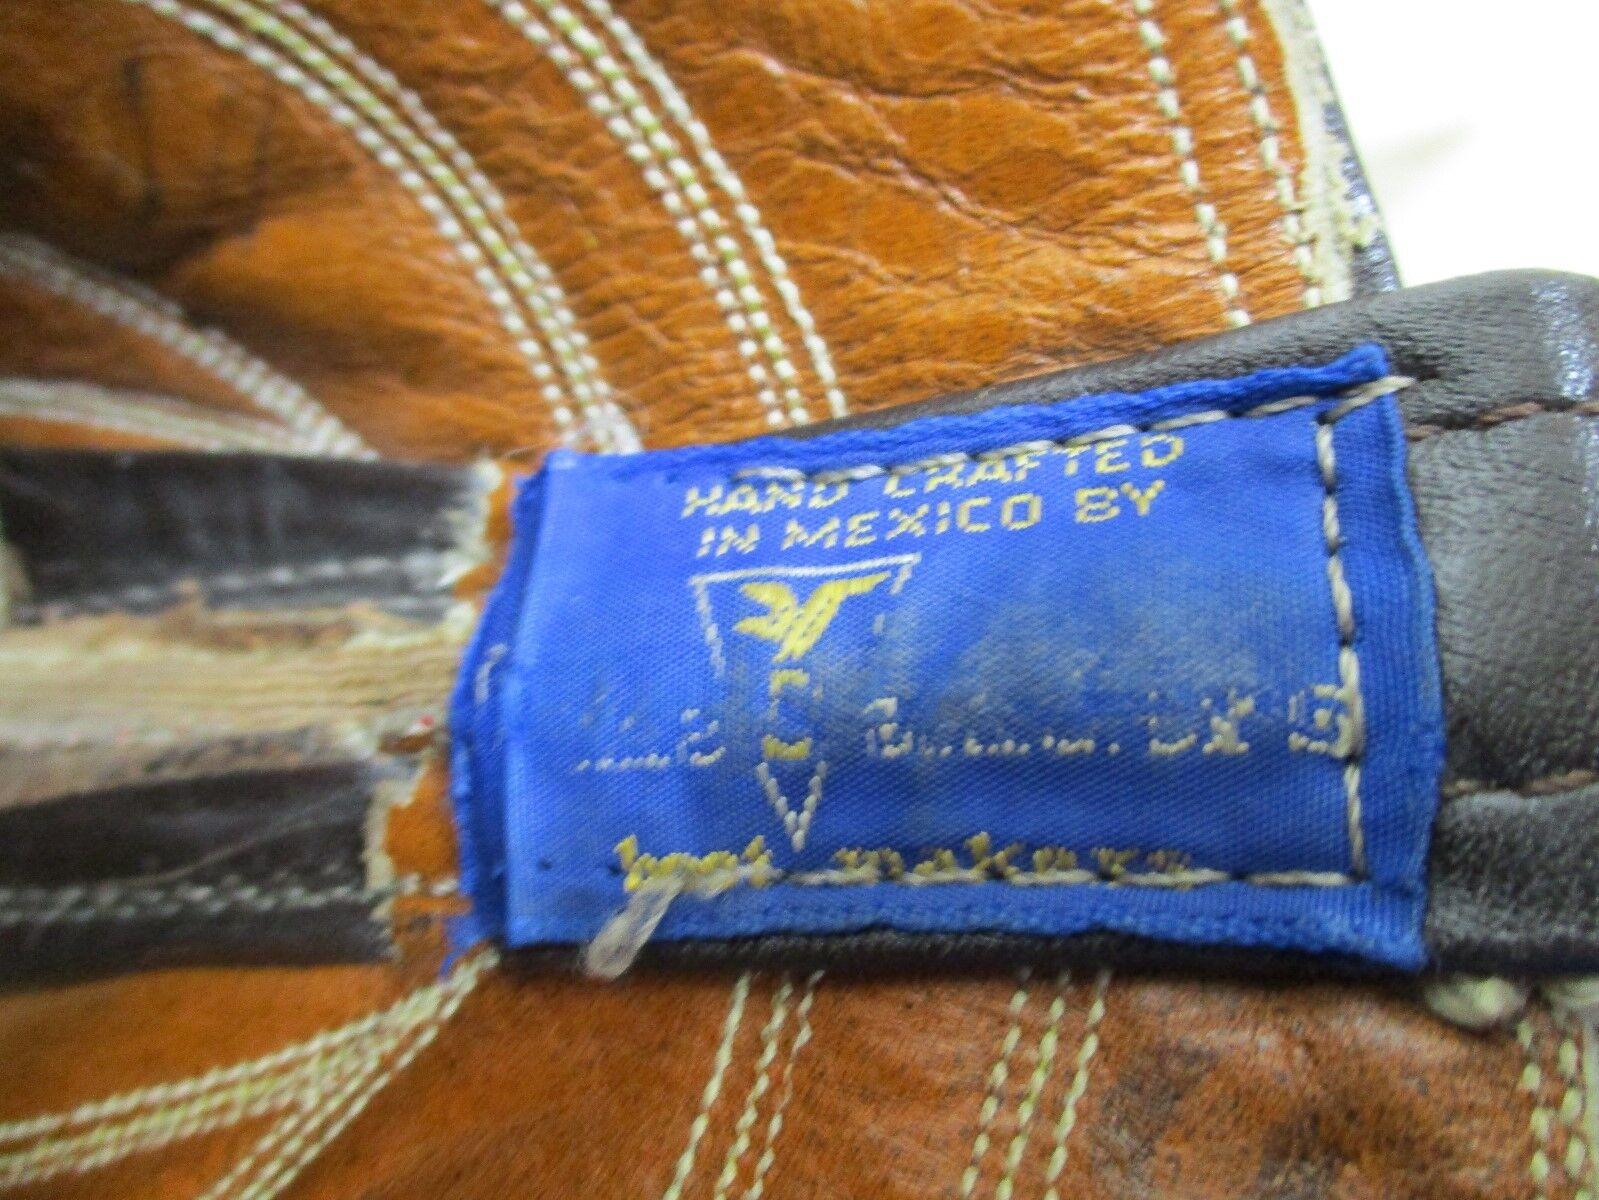 SANDERS Braun Leder Cowboy Stiefel Style Damenschuhe Größe 6 A Style Stiefel 3022 29ff9f